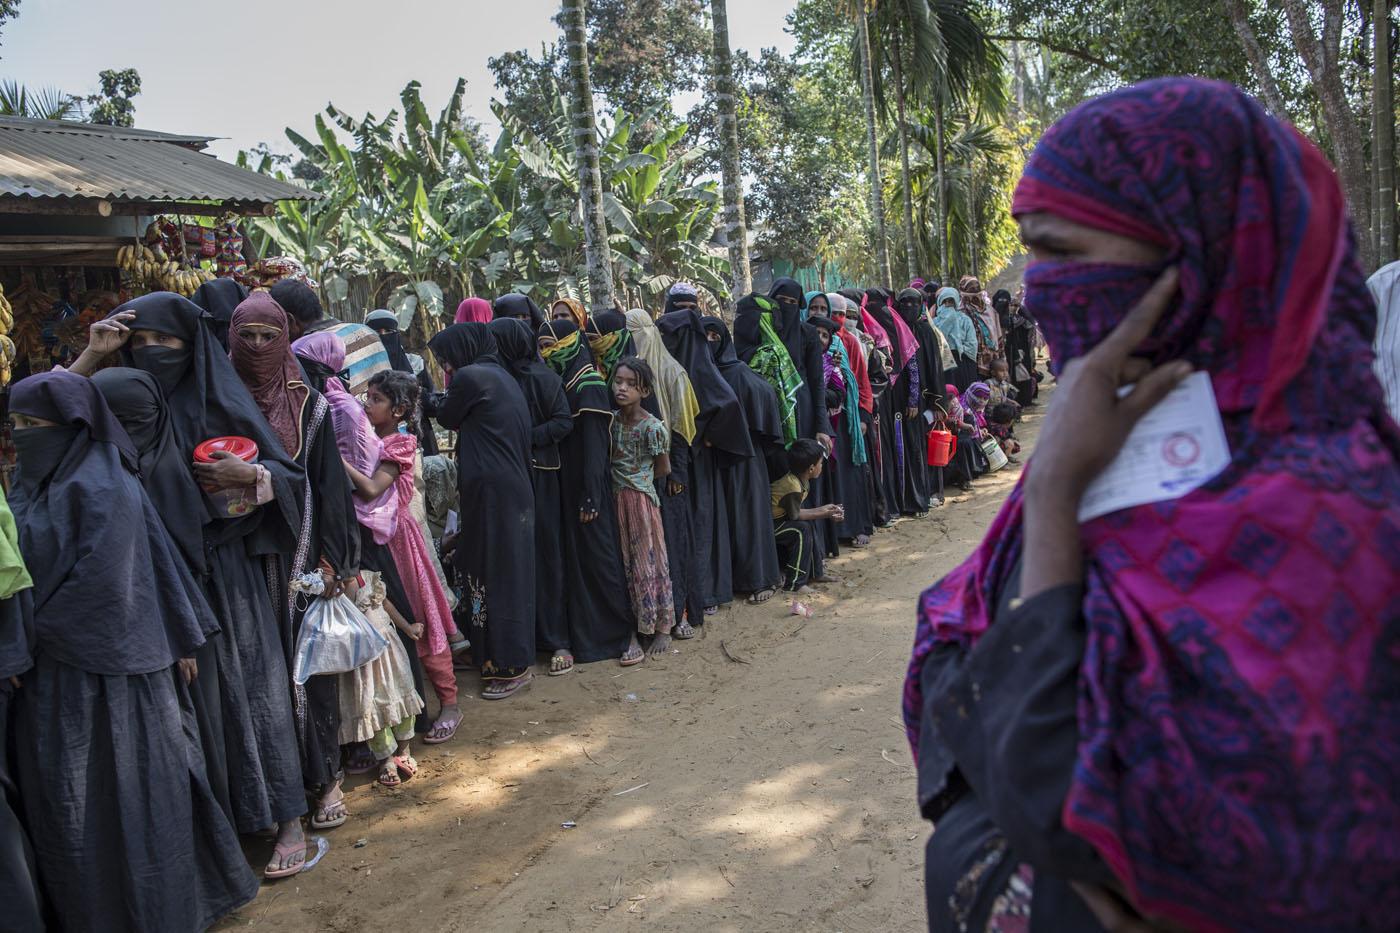 Probal Rashid_Bangladesh_The Rohingyas-A People Without A Home_07.jpg